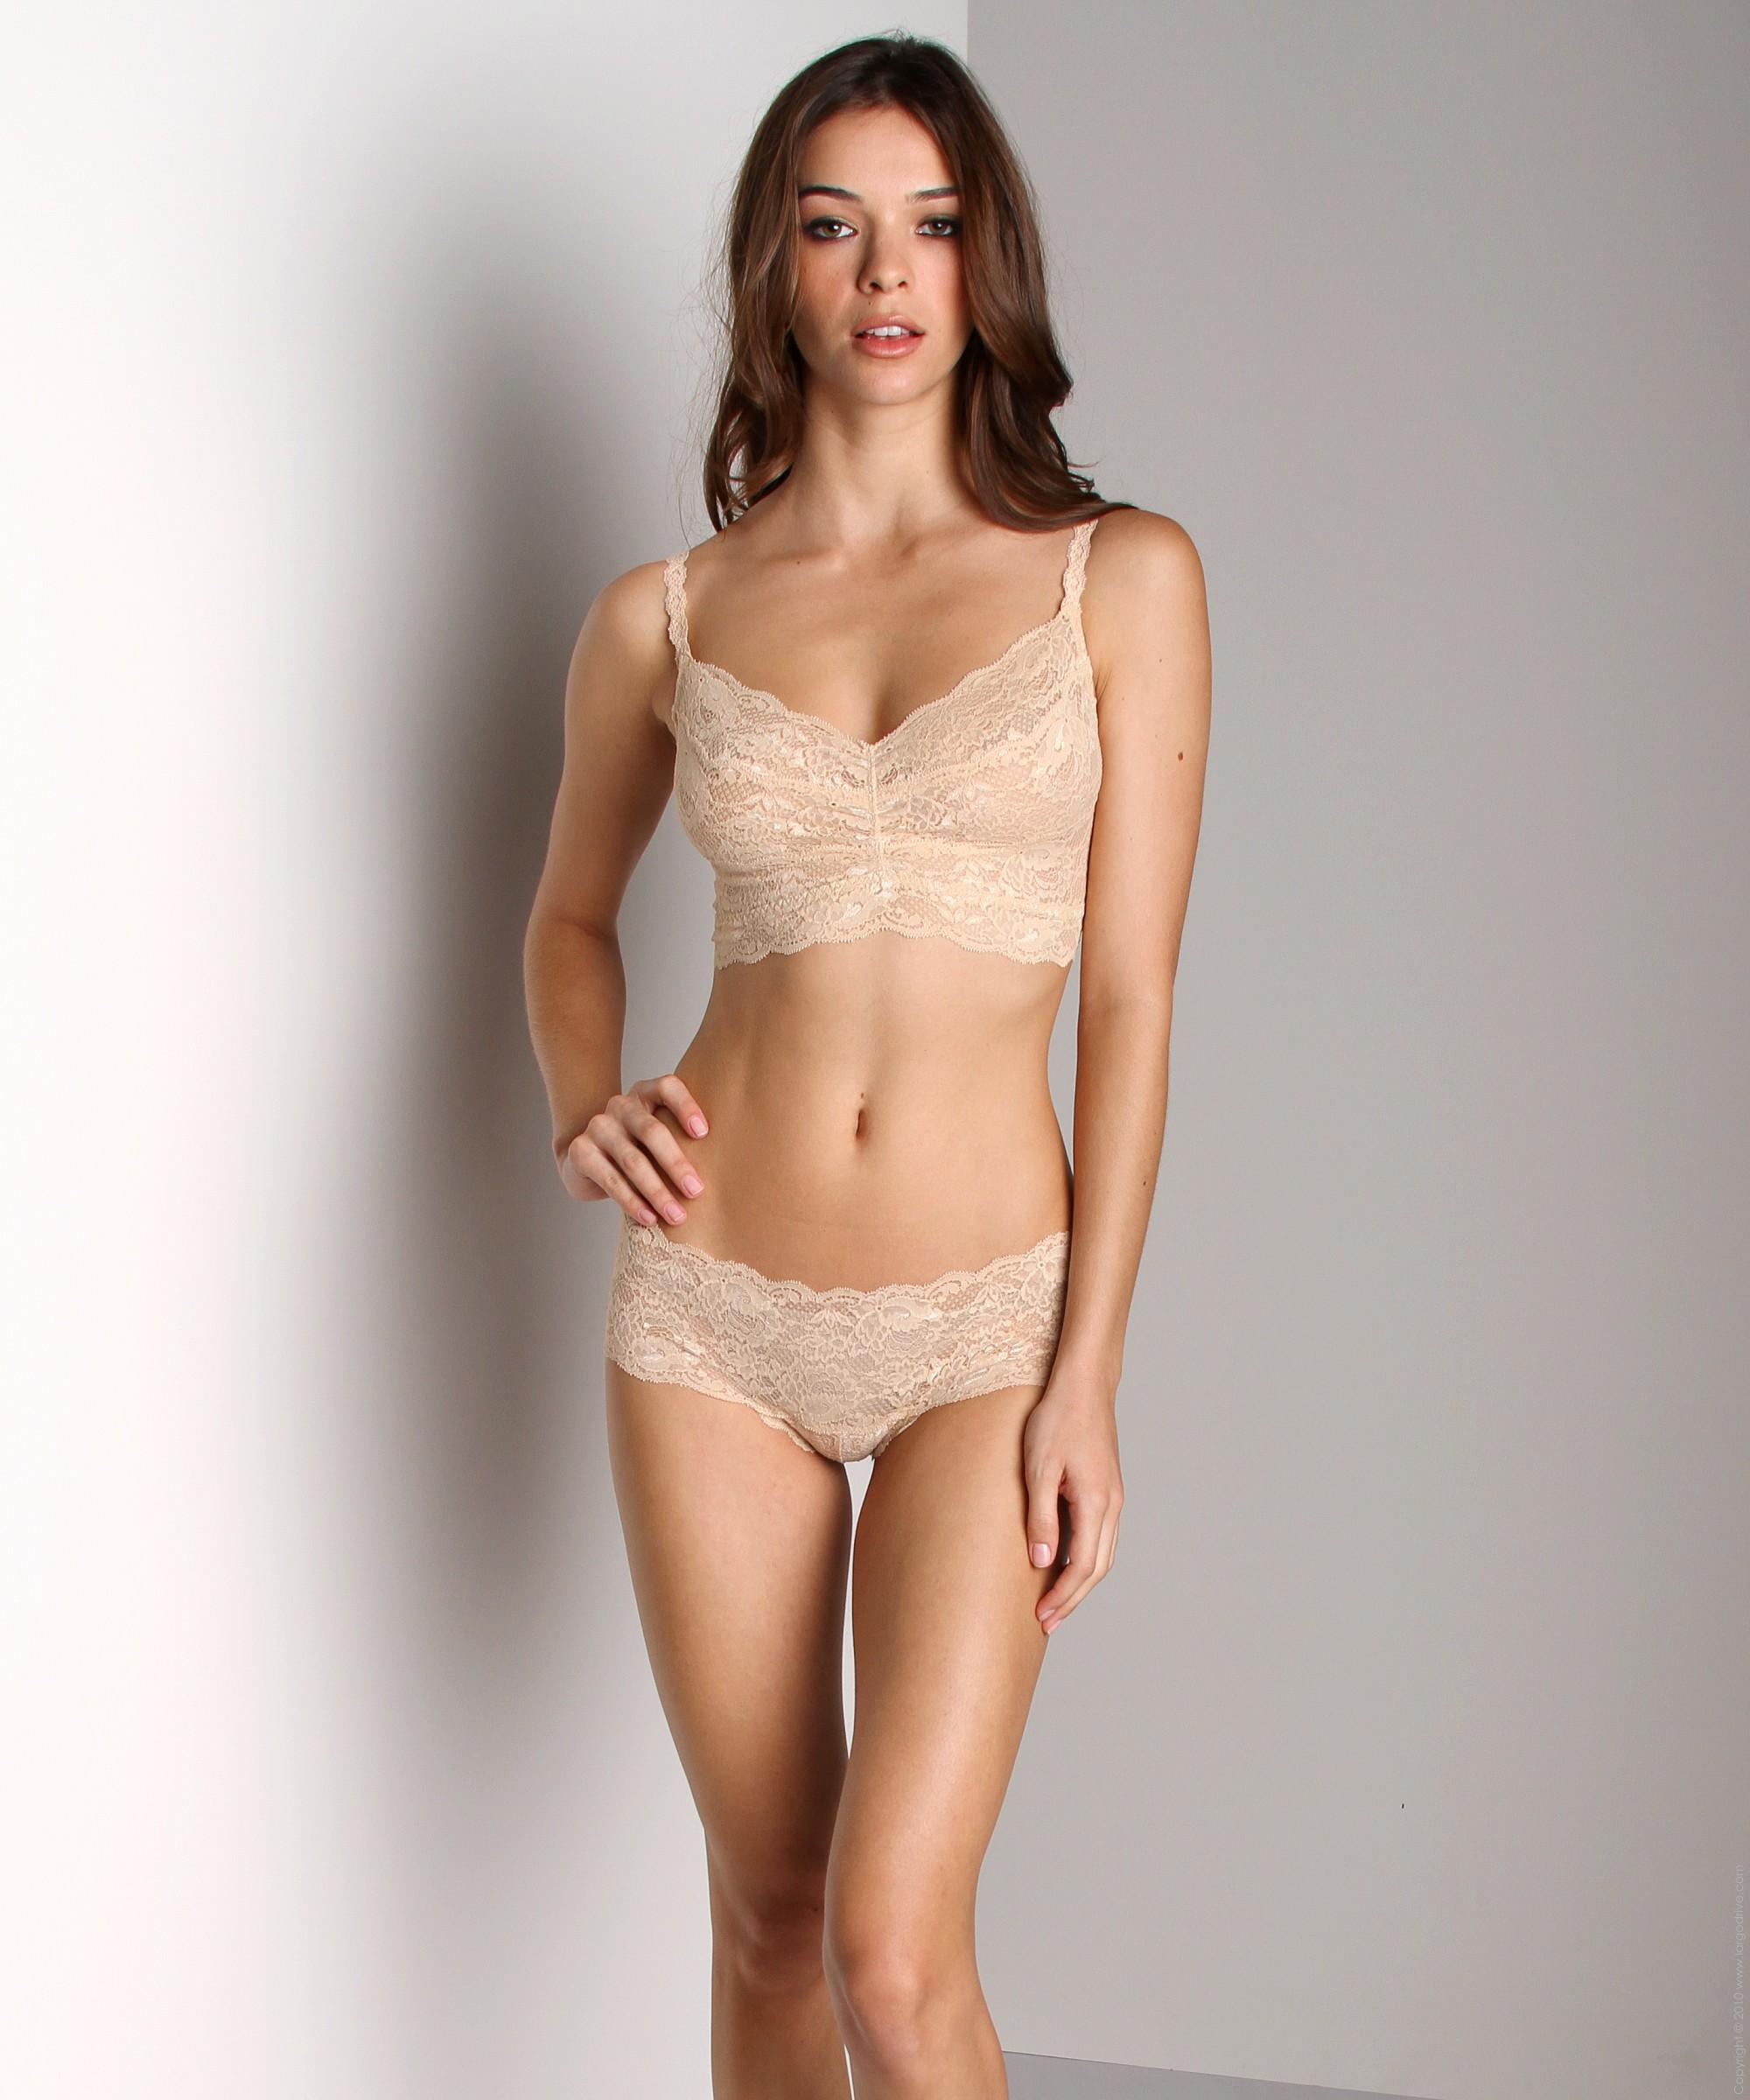 Mariana Almeida in lingerie